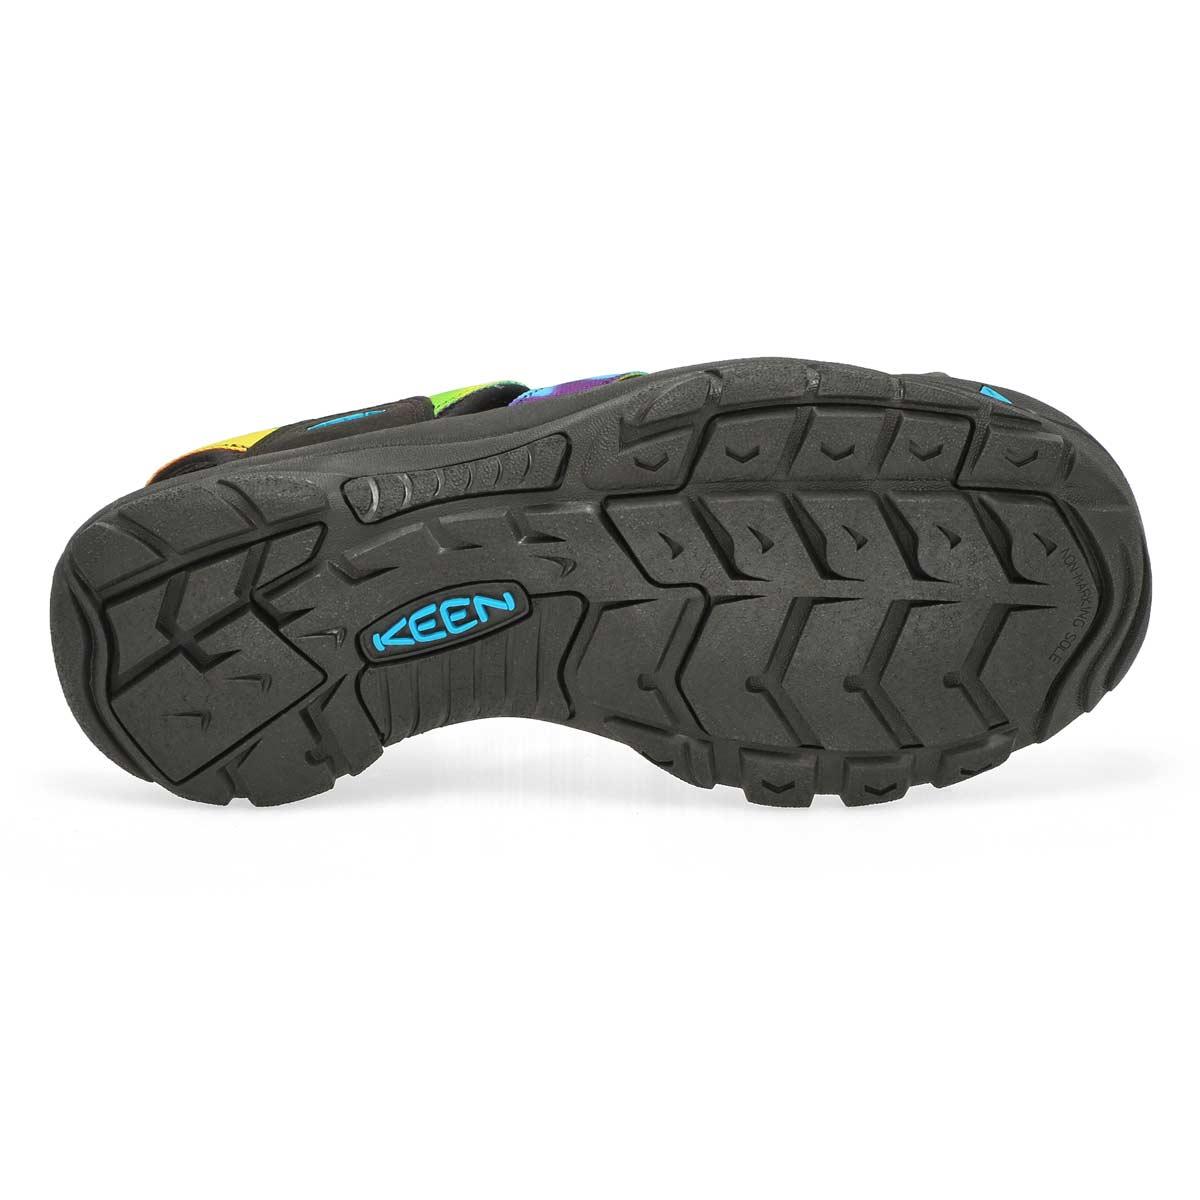 Mens Newport Retro tie dye sport sandal